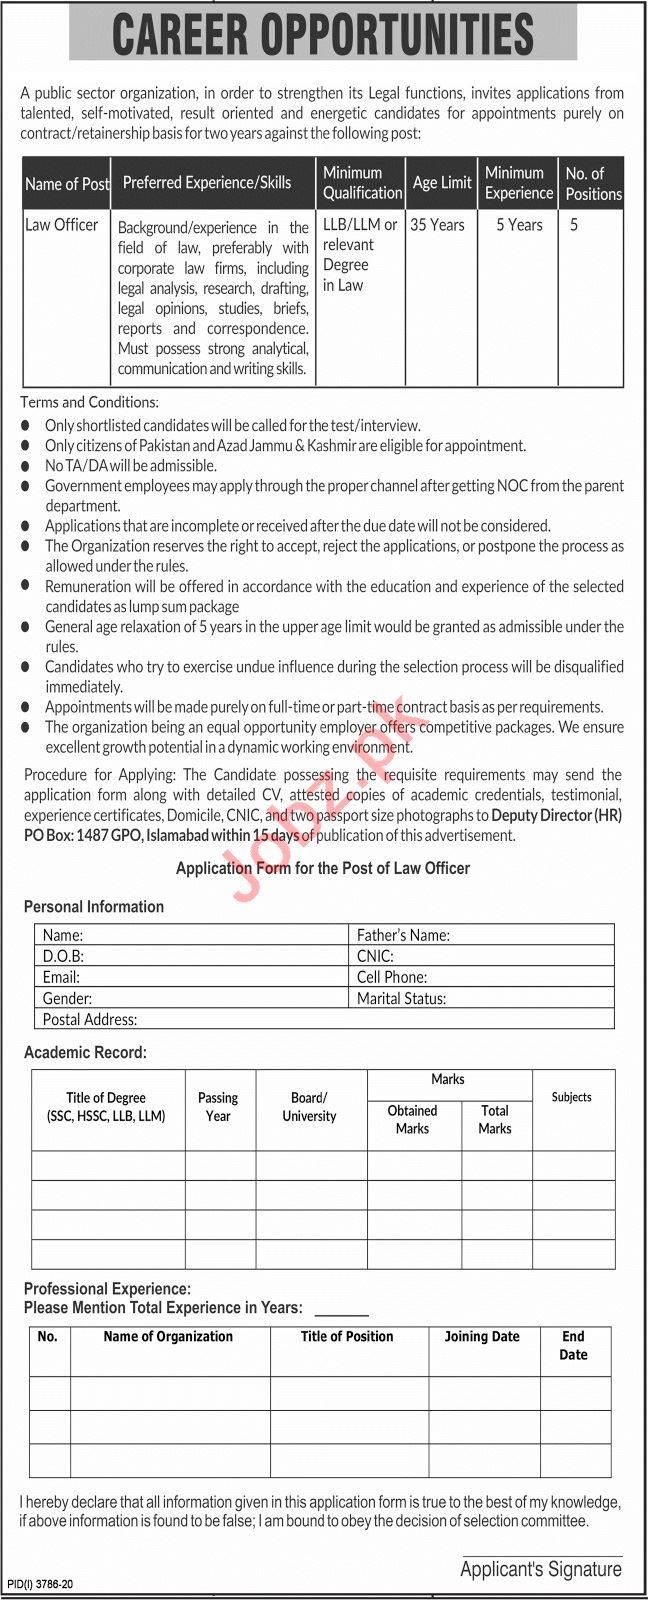 Law Officer Jobs 2021 in Public Sector Organization